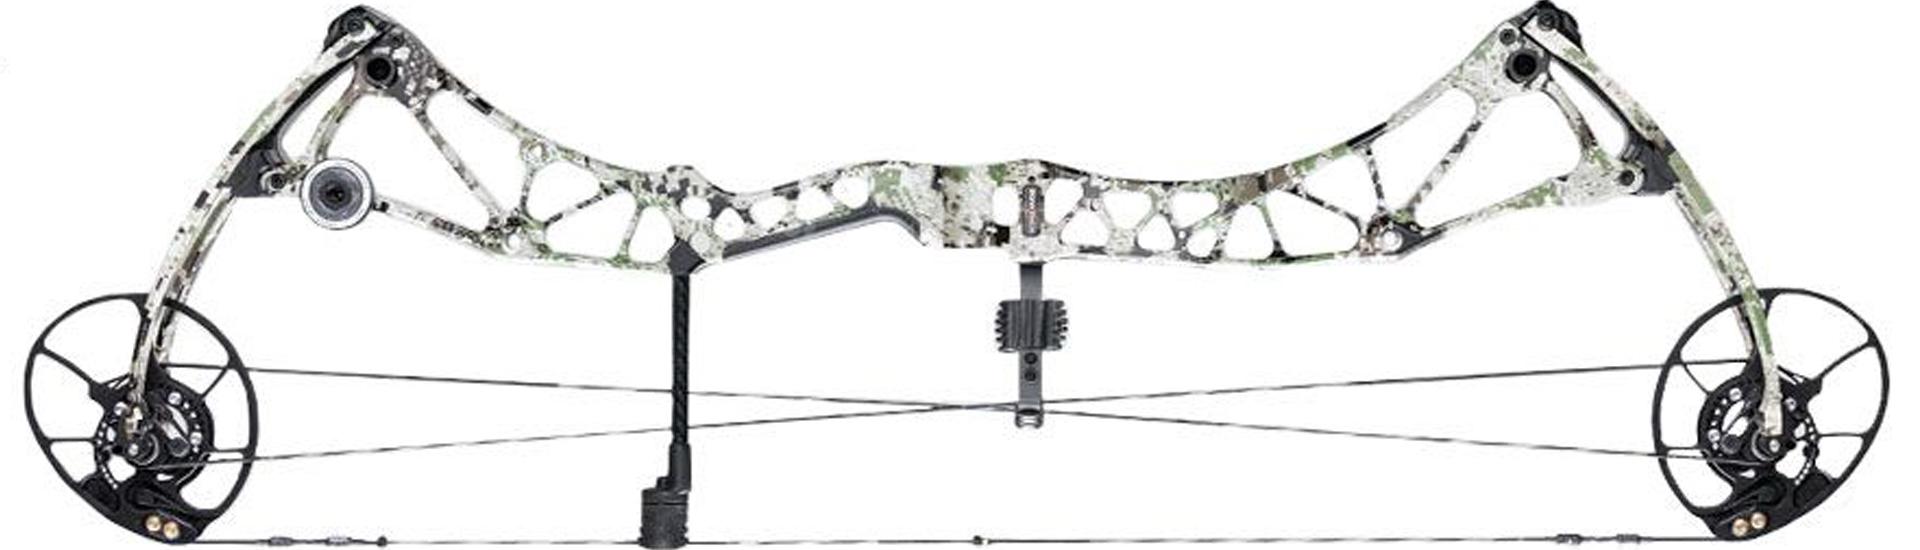 Bowtech Crossbow / Arbalet Getirtmek